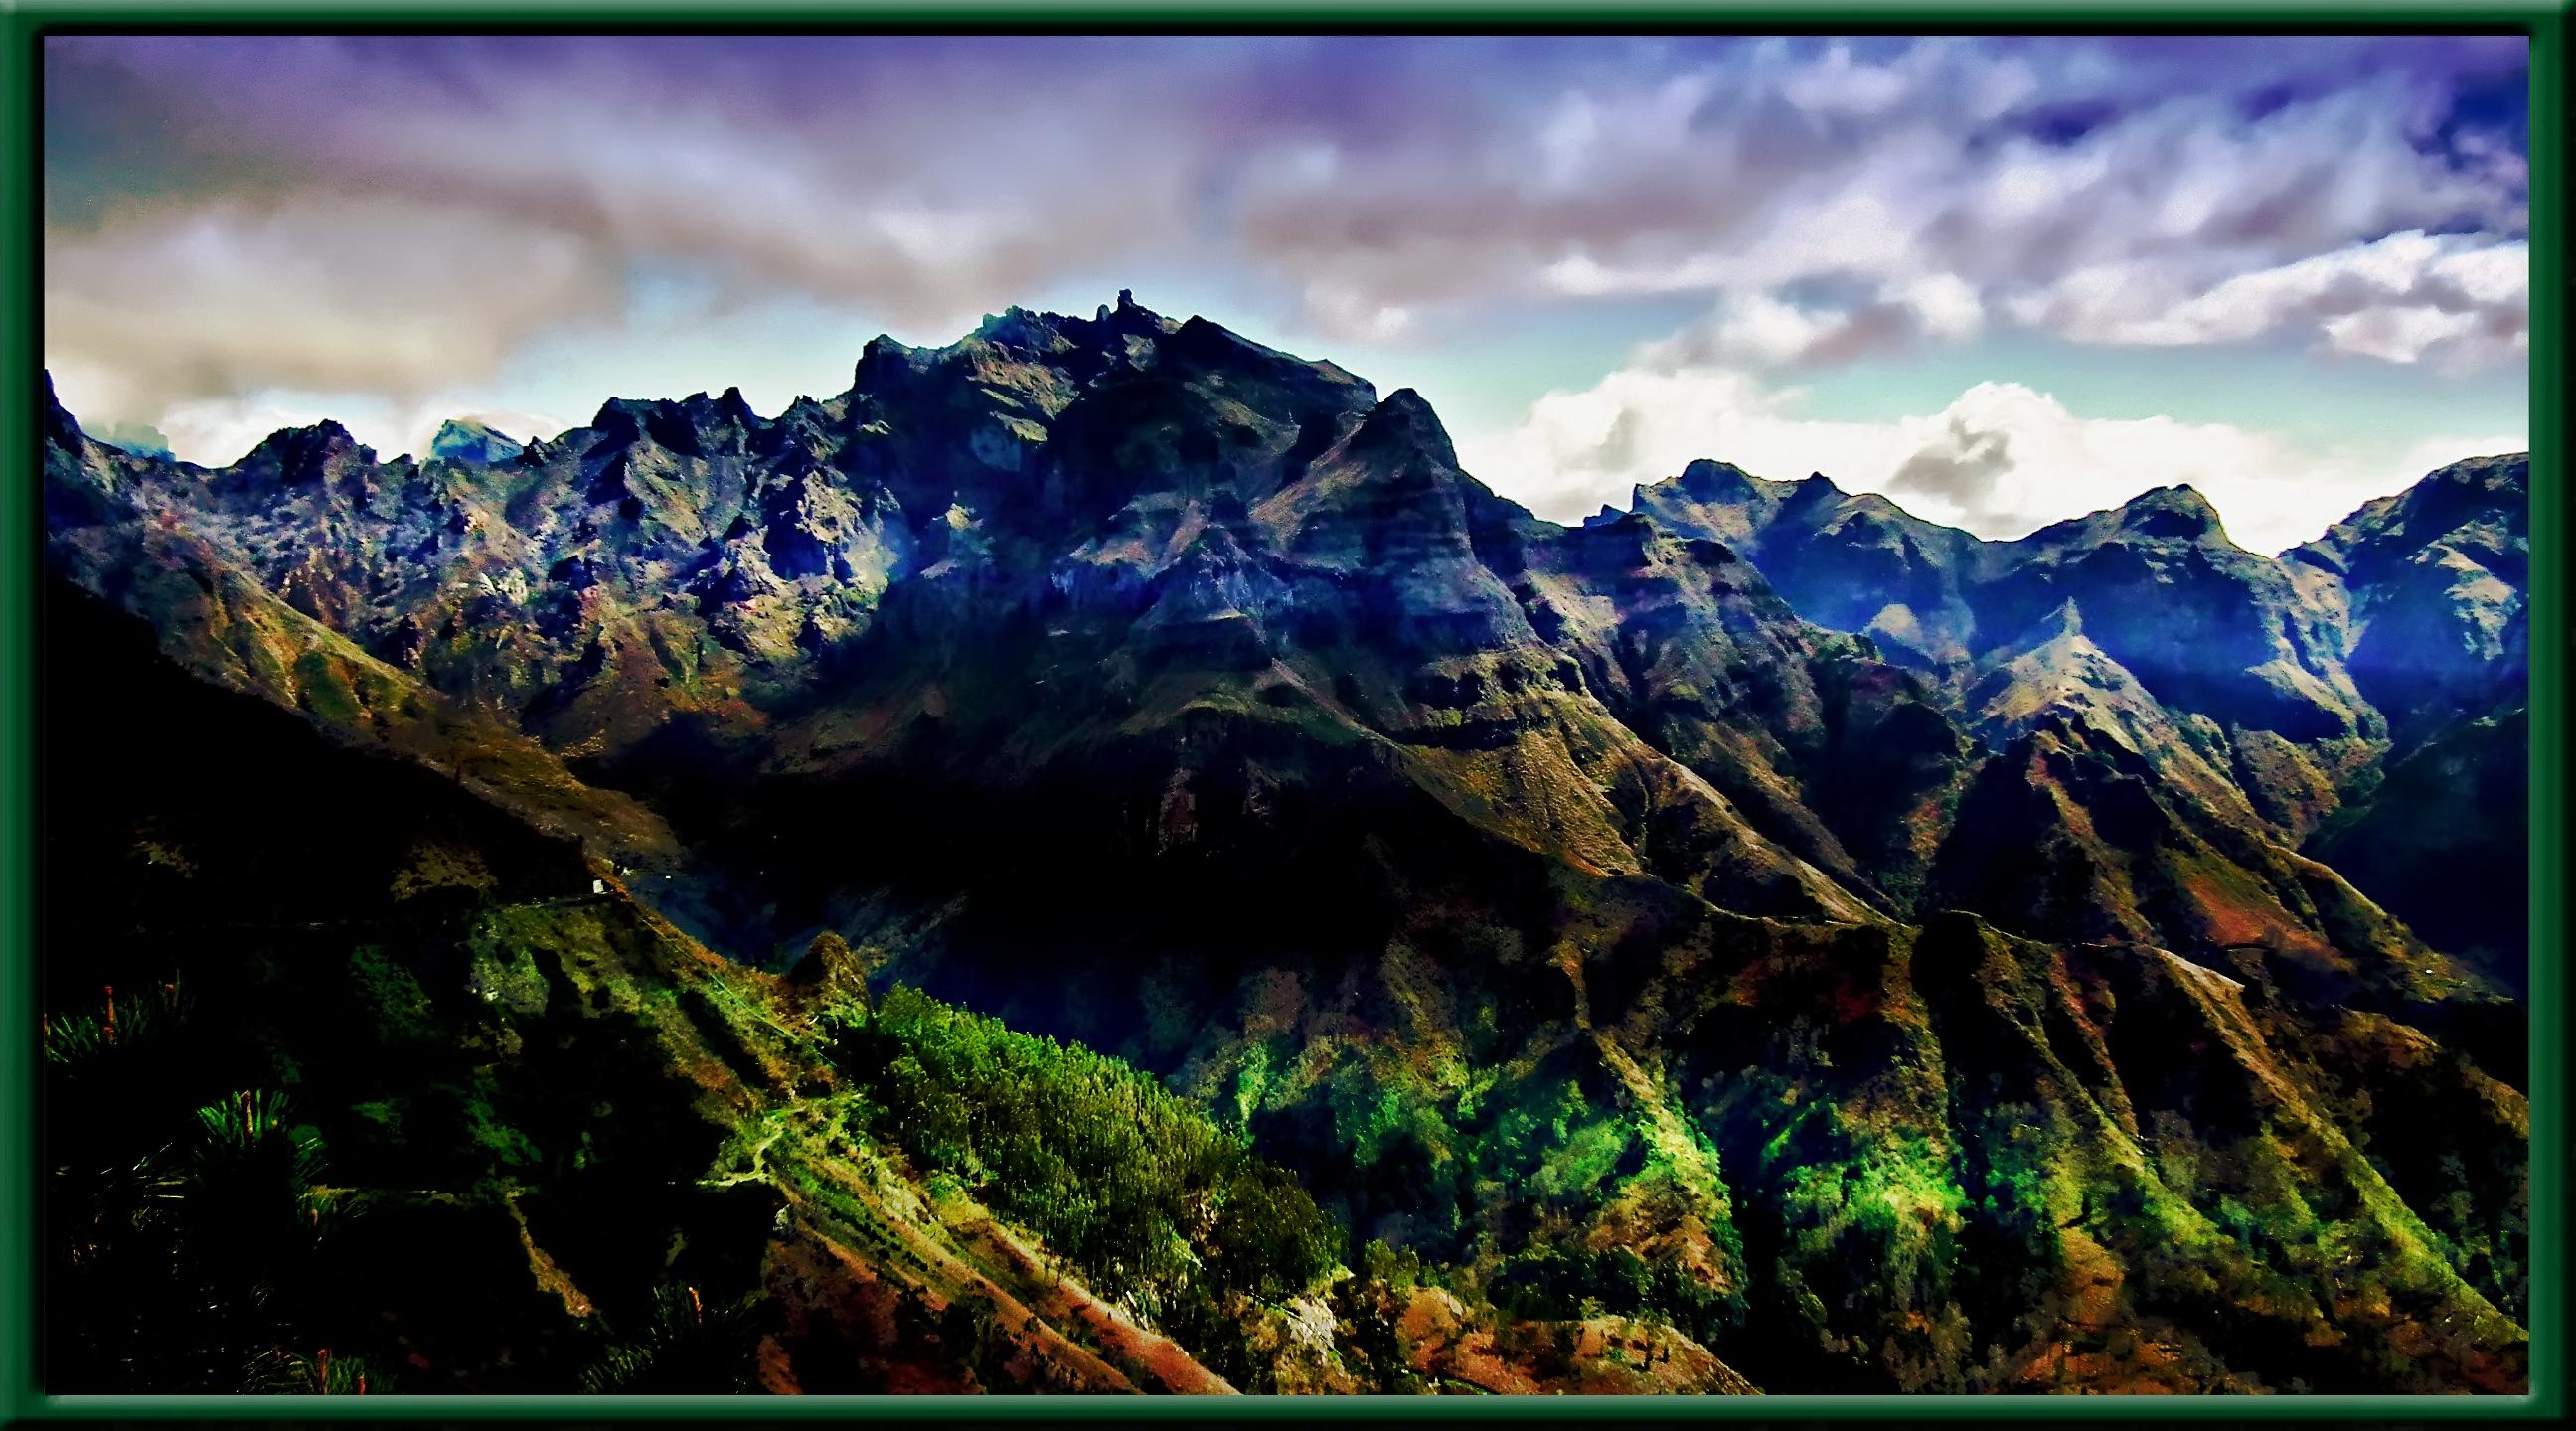 Top Wallpaper Music Food - santa-music-food-Sun-mountain-church-rain-gardens-clouds-swimming-landscape-coast-dance-fishing-walks-sailing-wine-Maria-religion-scenic-folklore-entertainment-views-boating-Hotels-levada-lido-Funchal-carnivals-976547  Snapshot_151356.jpg